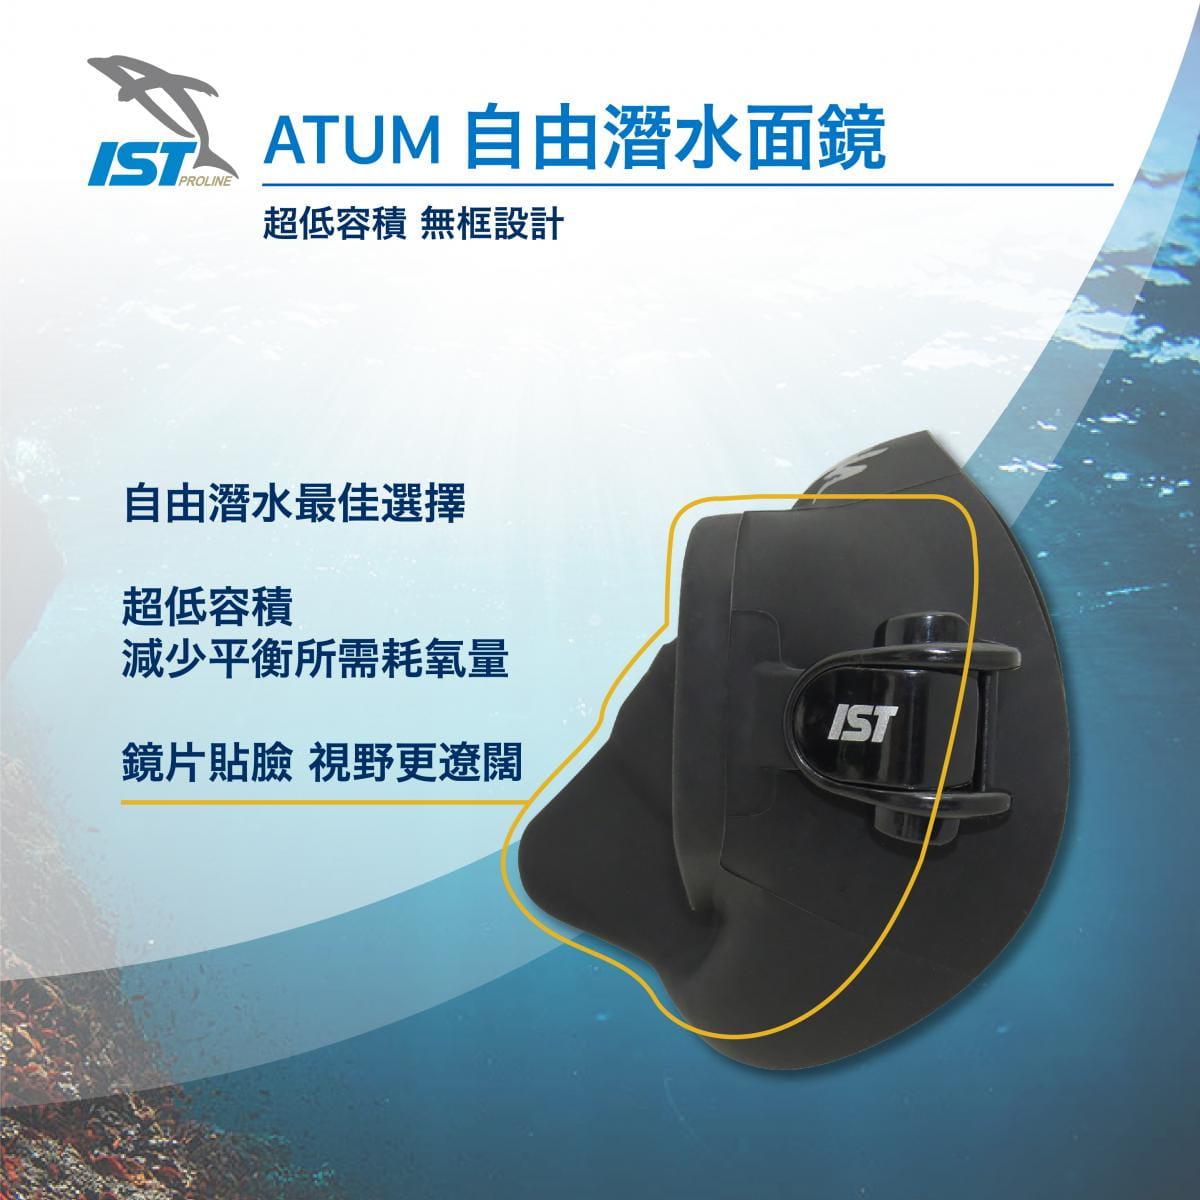 【IST】MIT ATUM 自由潛水面鏡 超低容積 無框設計 MP208 2